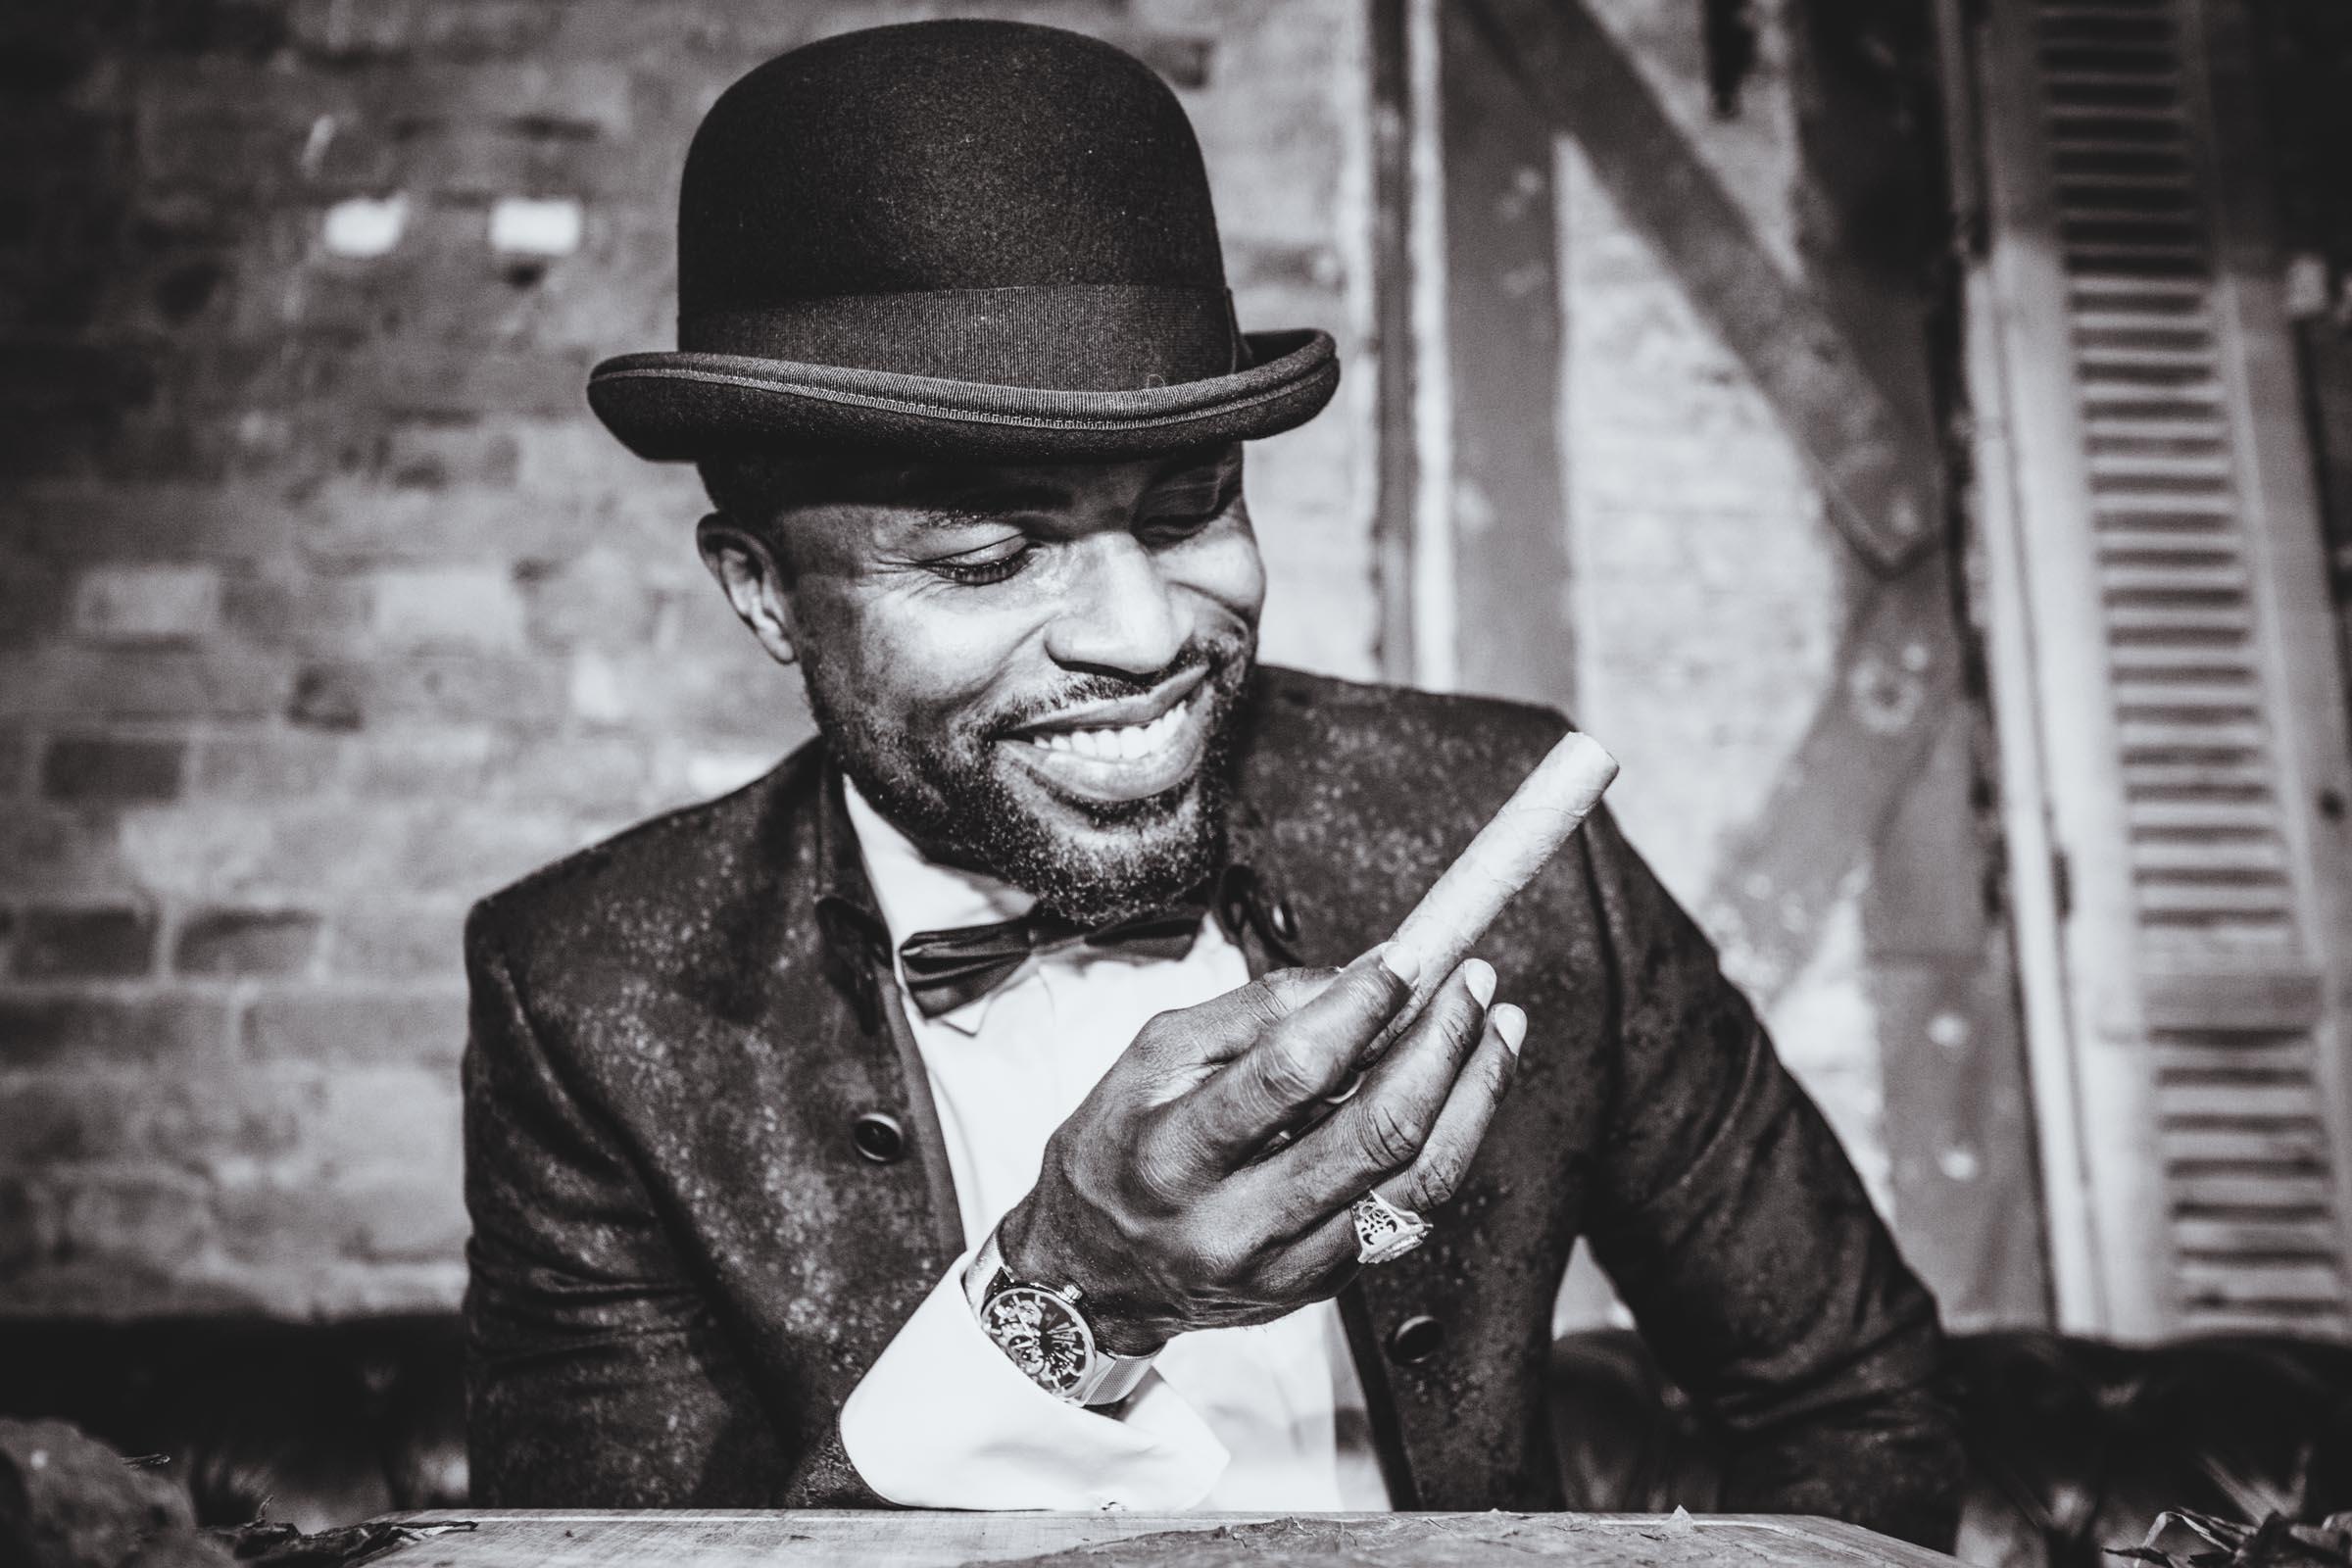 Zigarrenroller - Zigarrendreher | Tabakmanufaktur | Event | Gala | Business |Buchen | Mieten | Anfragen